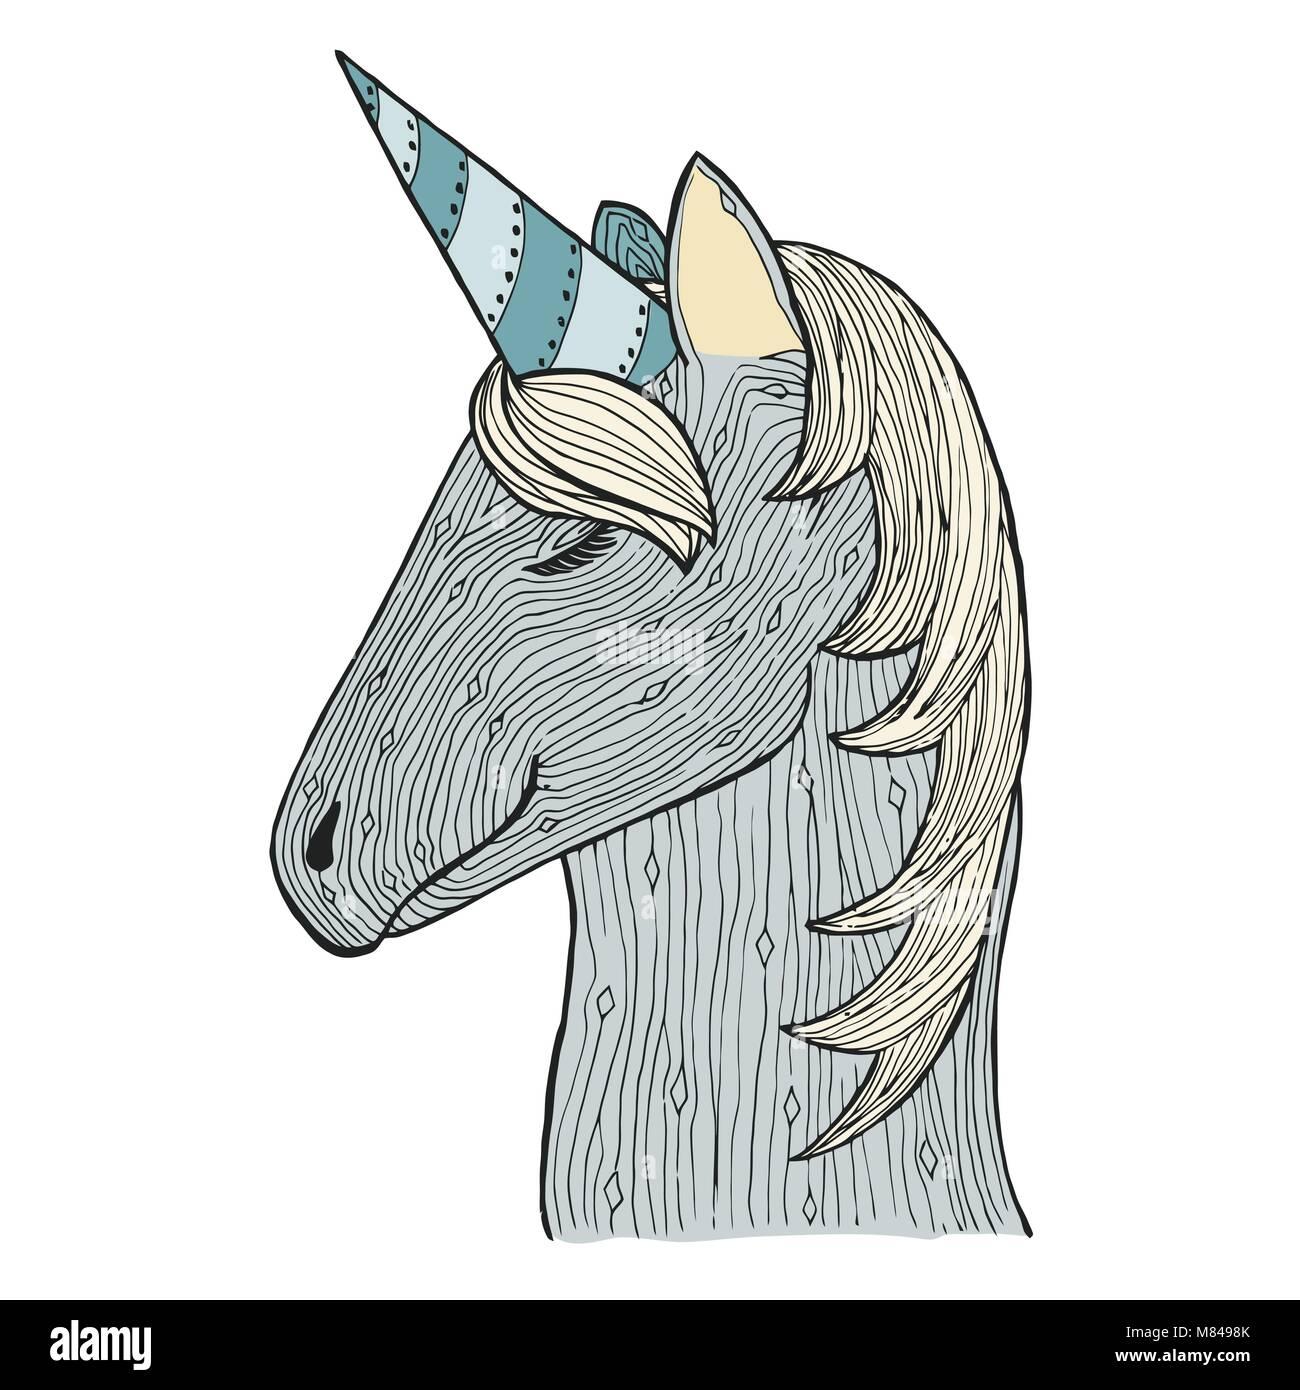 Vistoso Libro De Colorear Unicornio Molde - Enmarcado Para Colorear ...